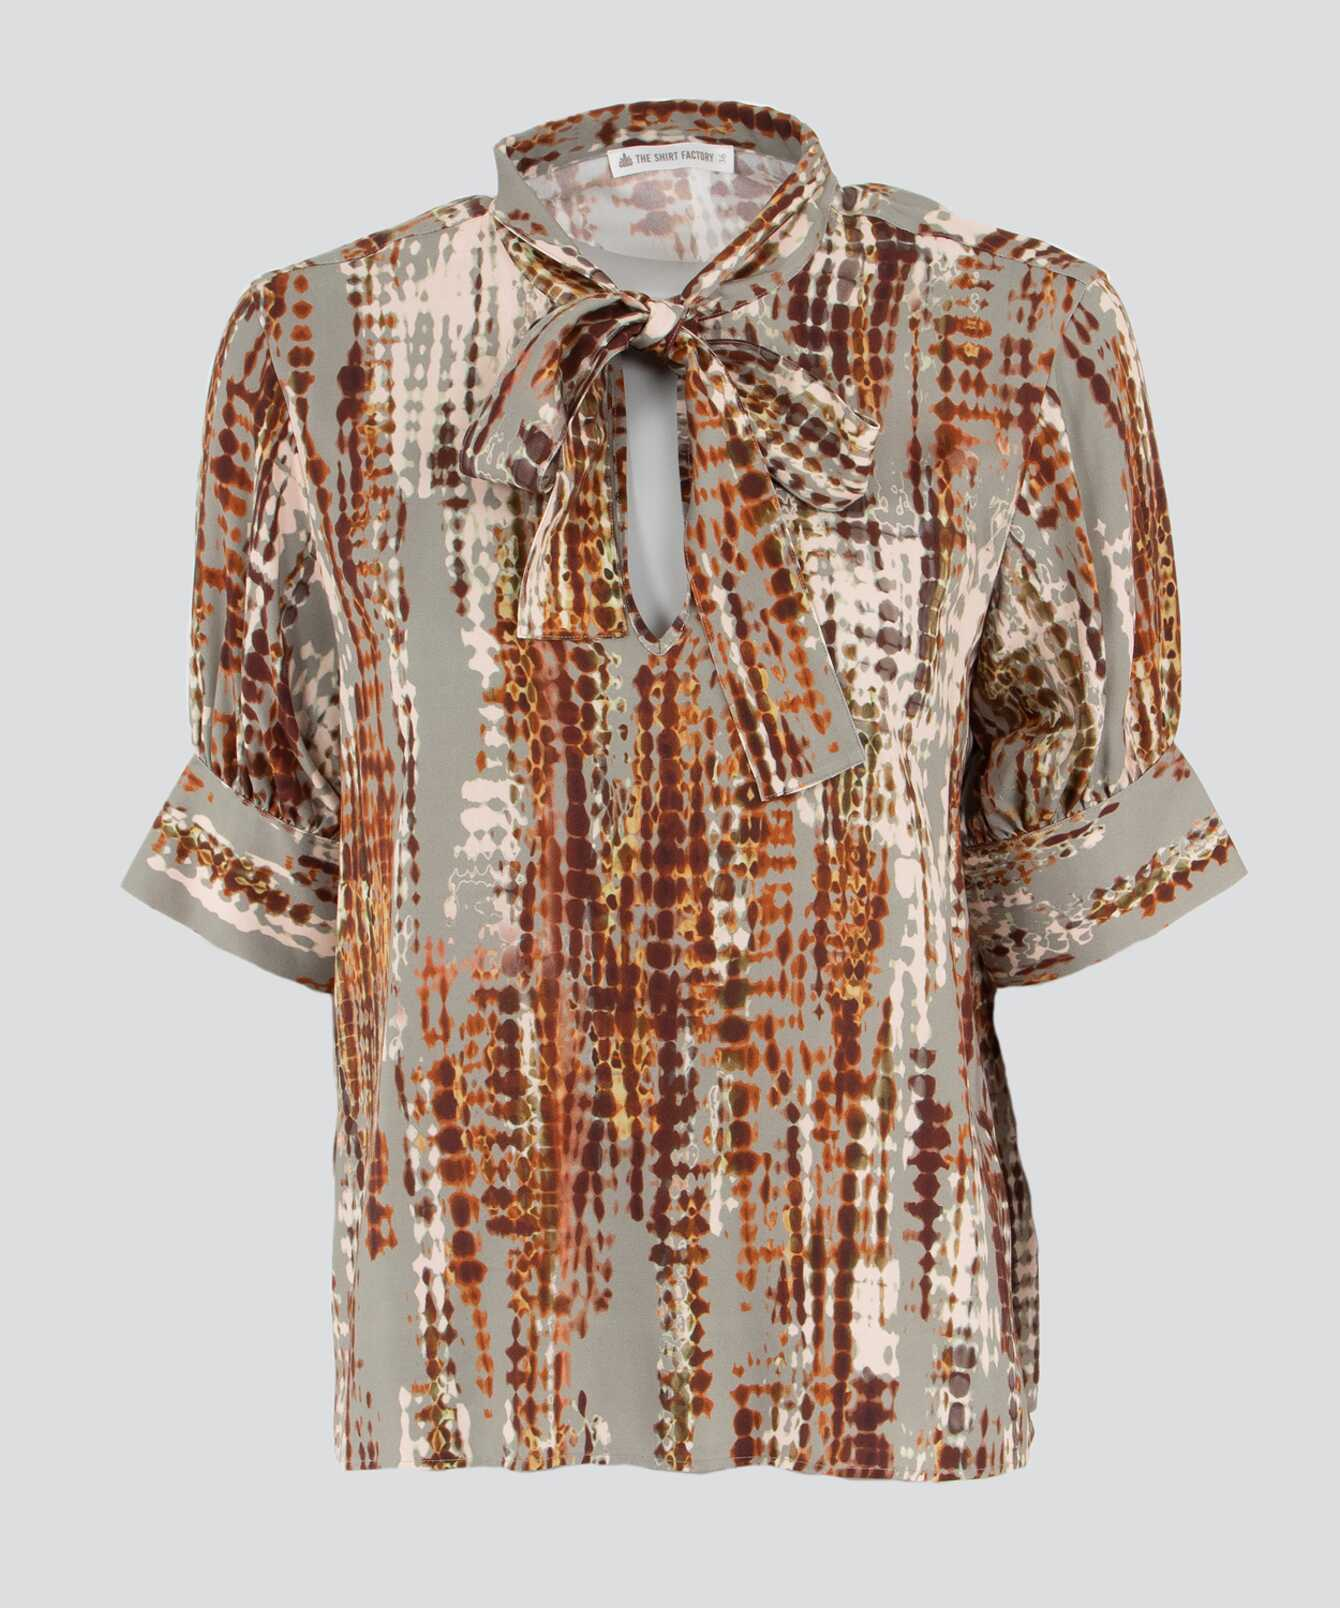 Shirt Sanna Rush The Shirt Factory